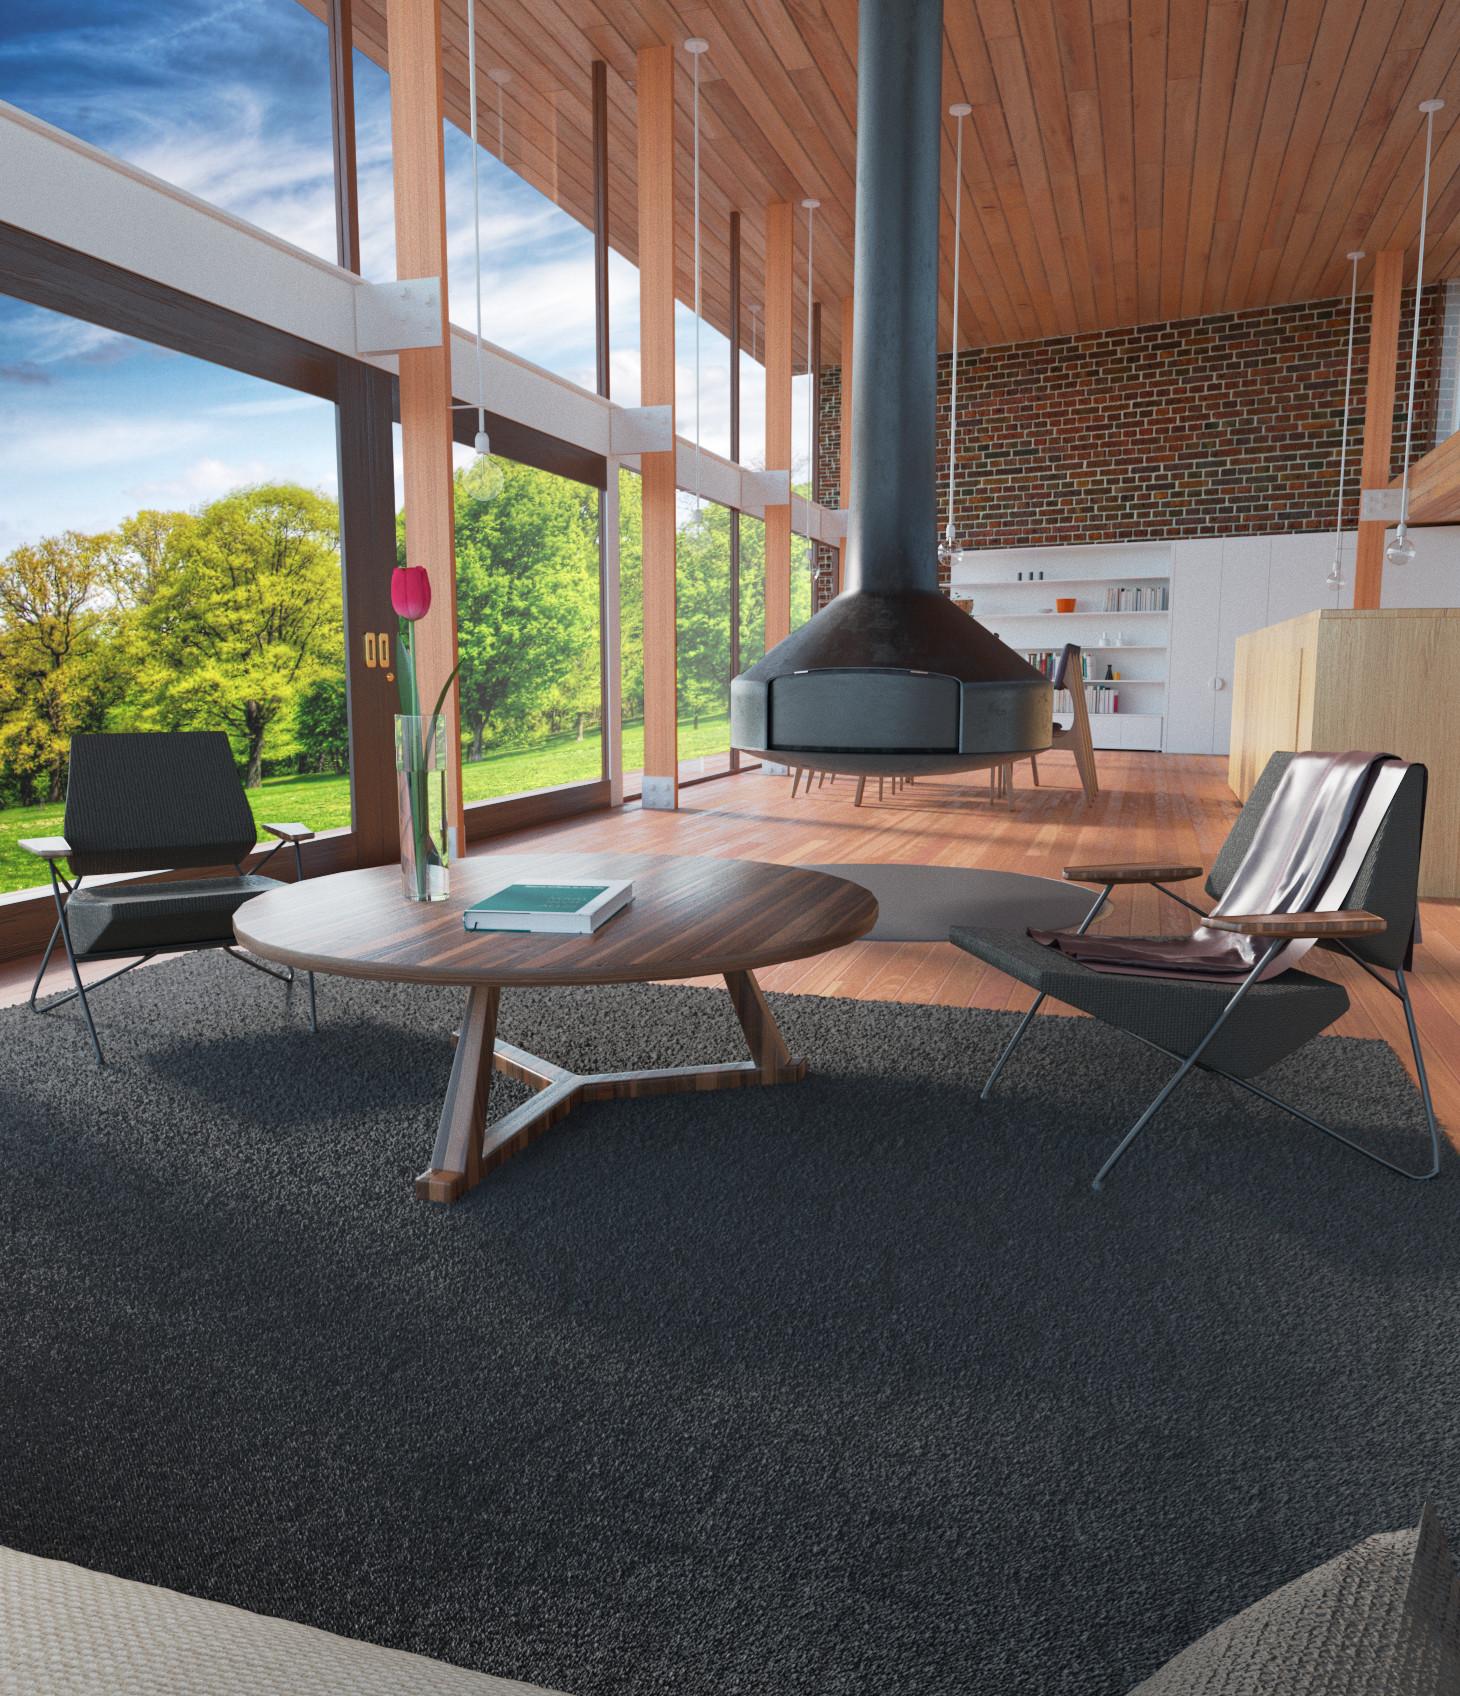 Oak house in 3d max corona render image